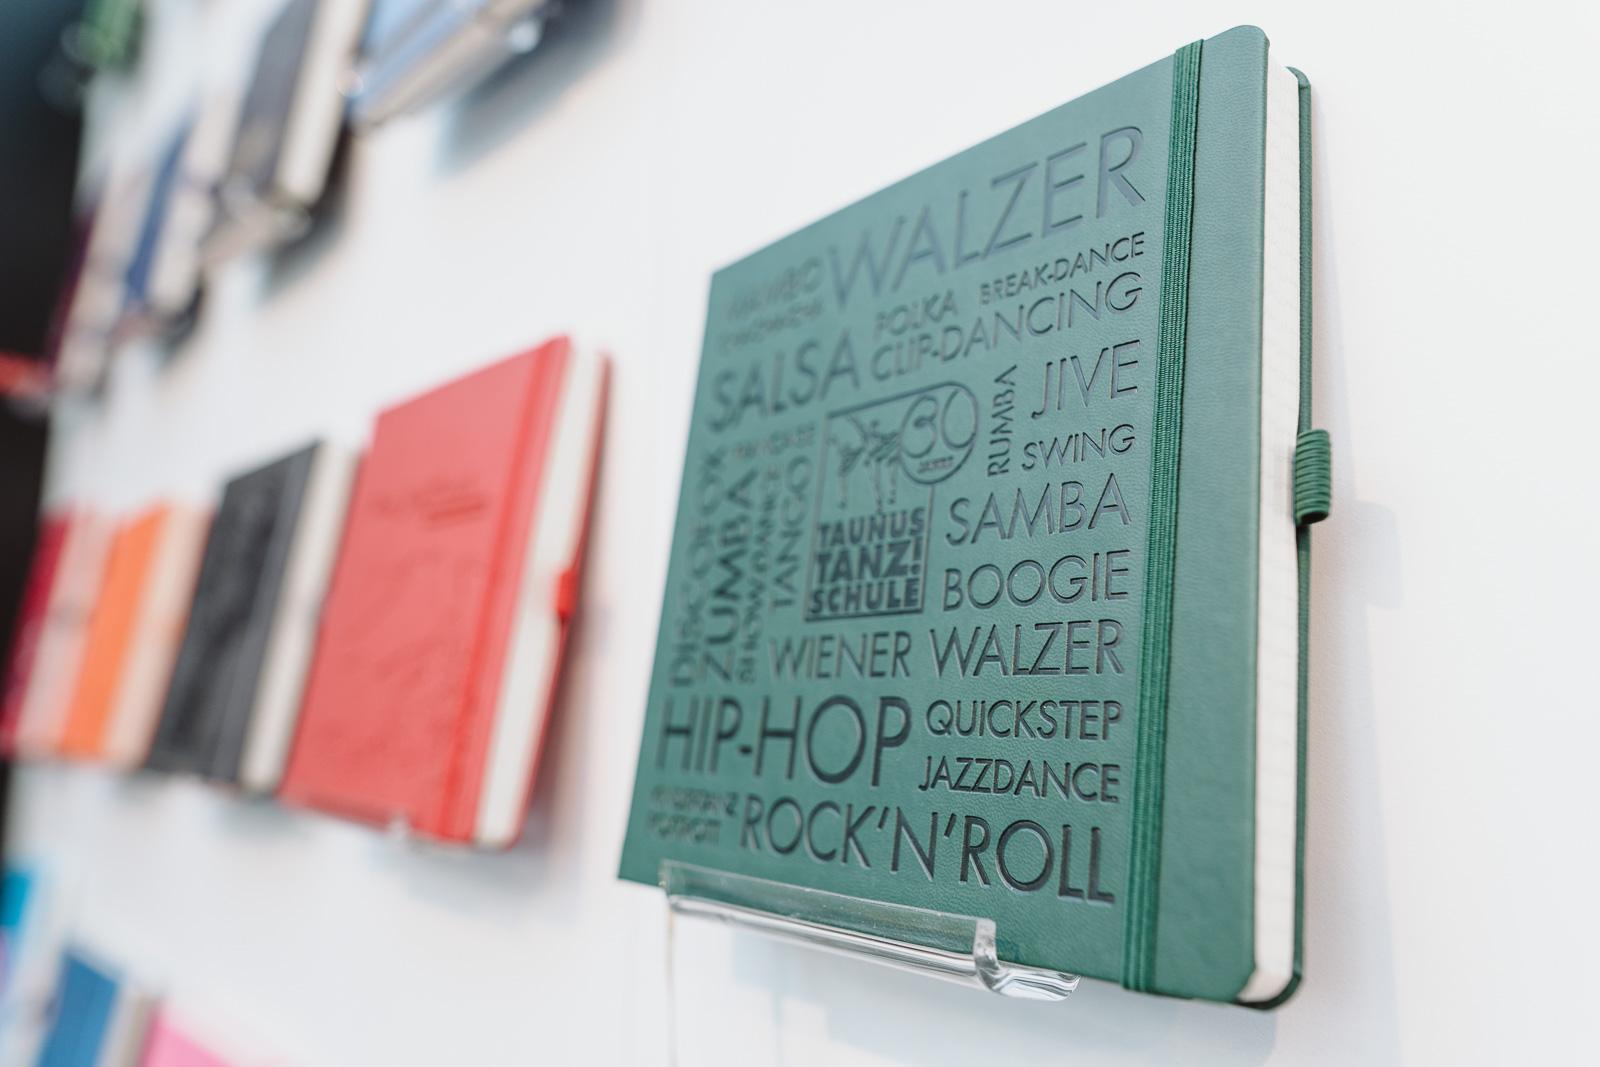 Messefotografie - Haptica - Bonn - Veranstalter WA Media - Bücher mit besonderer Haptik